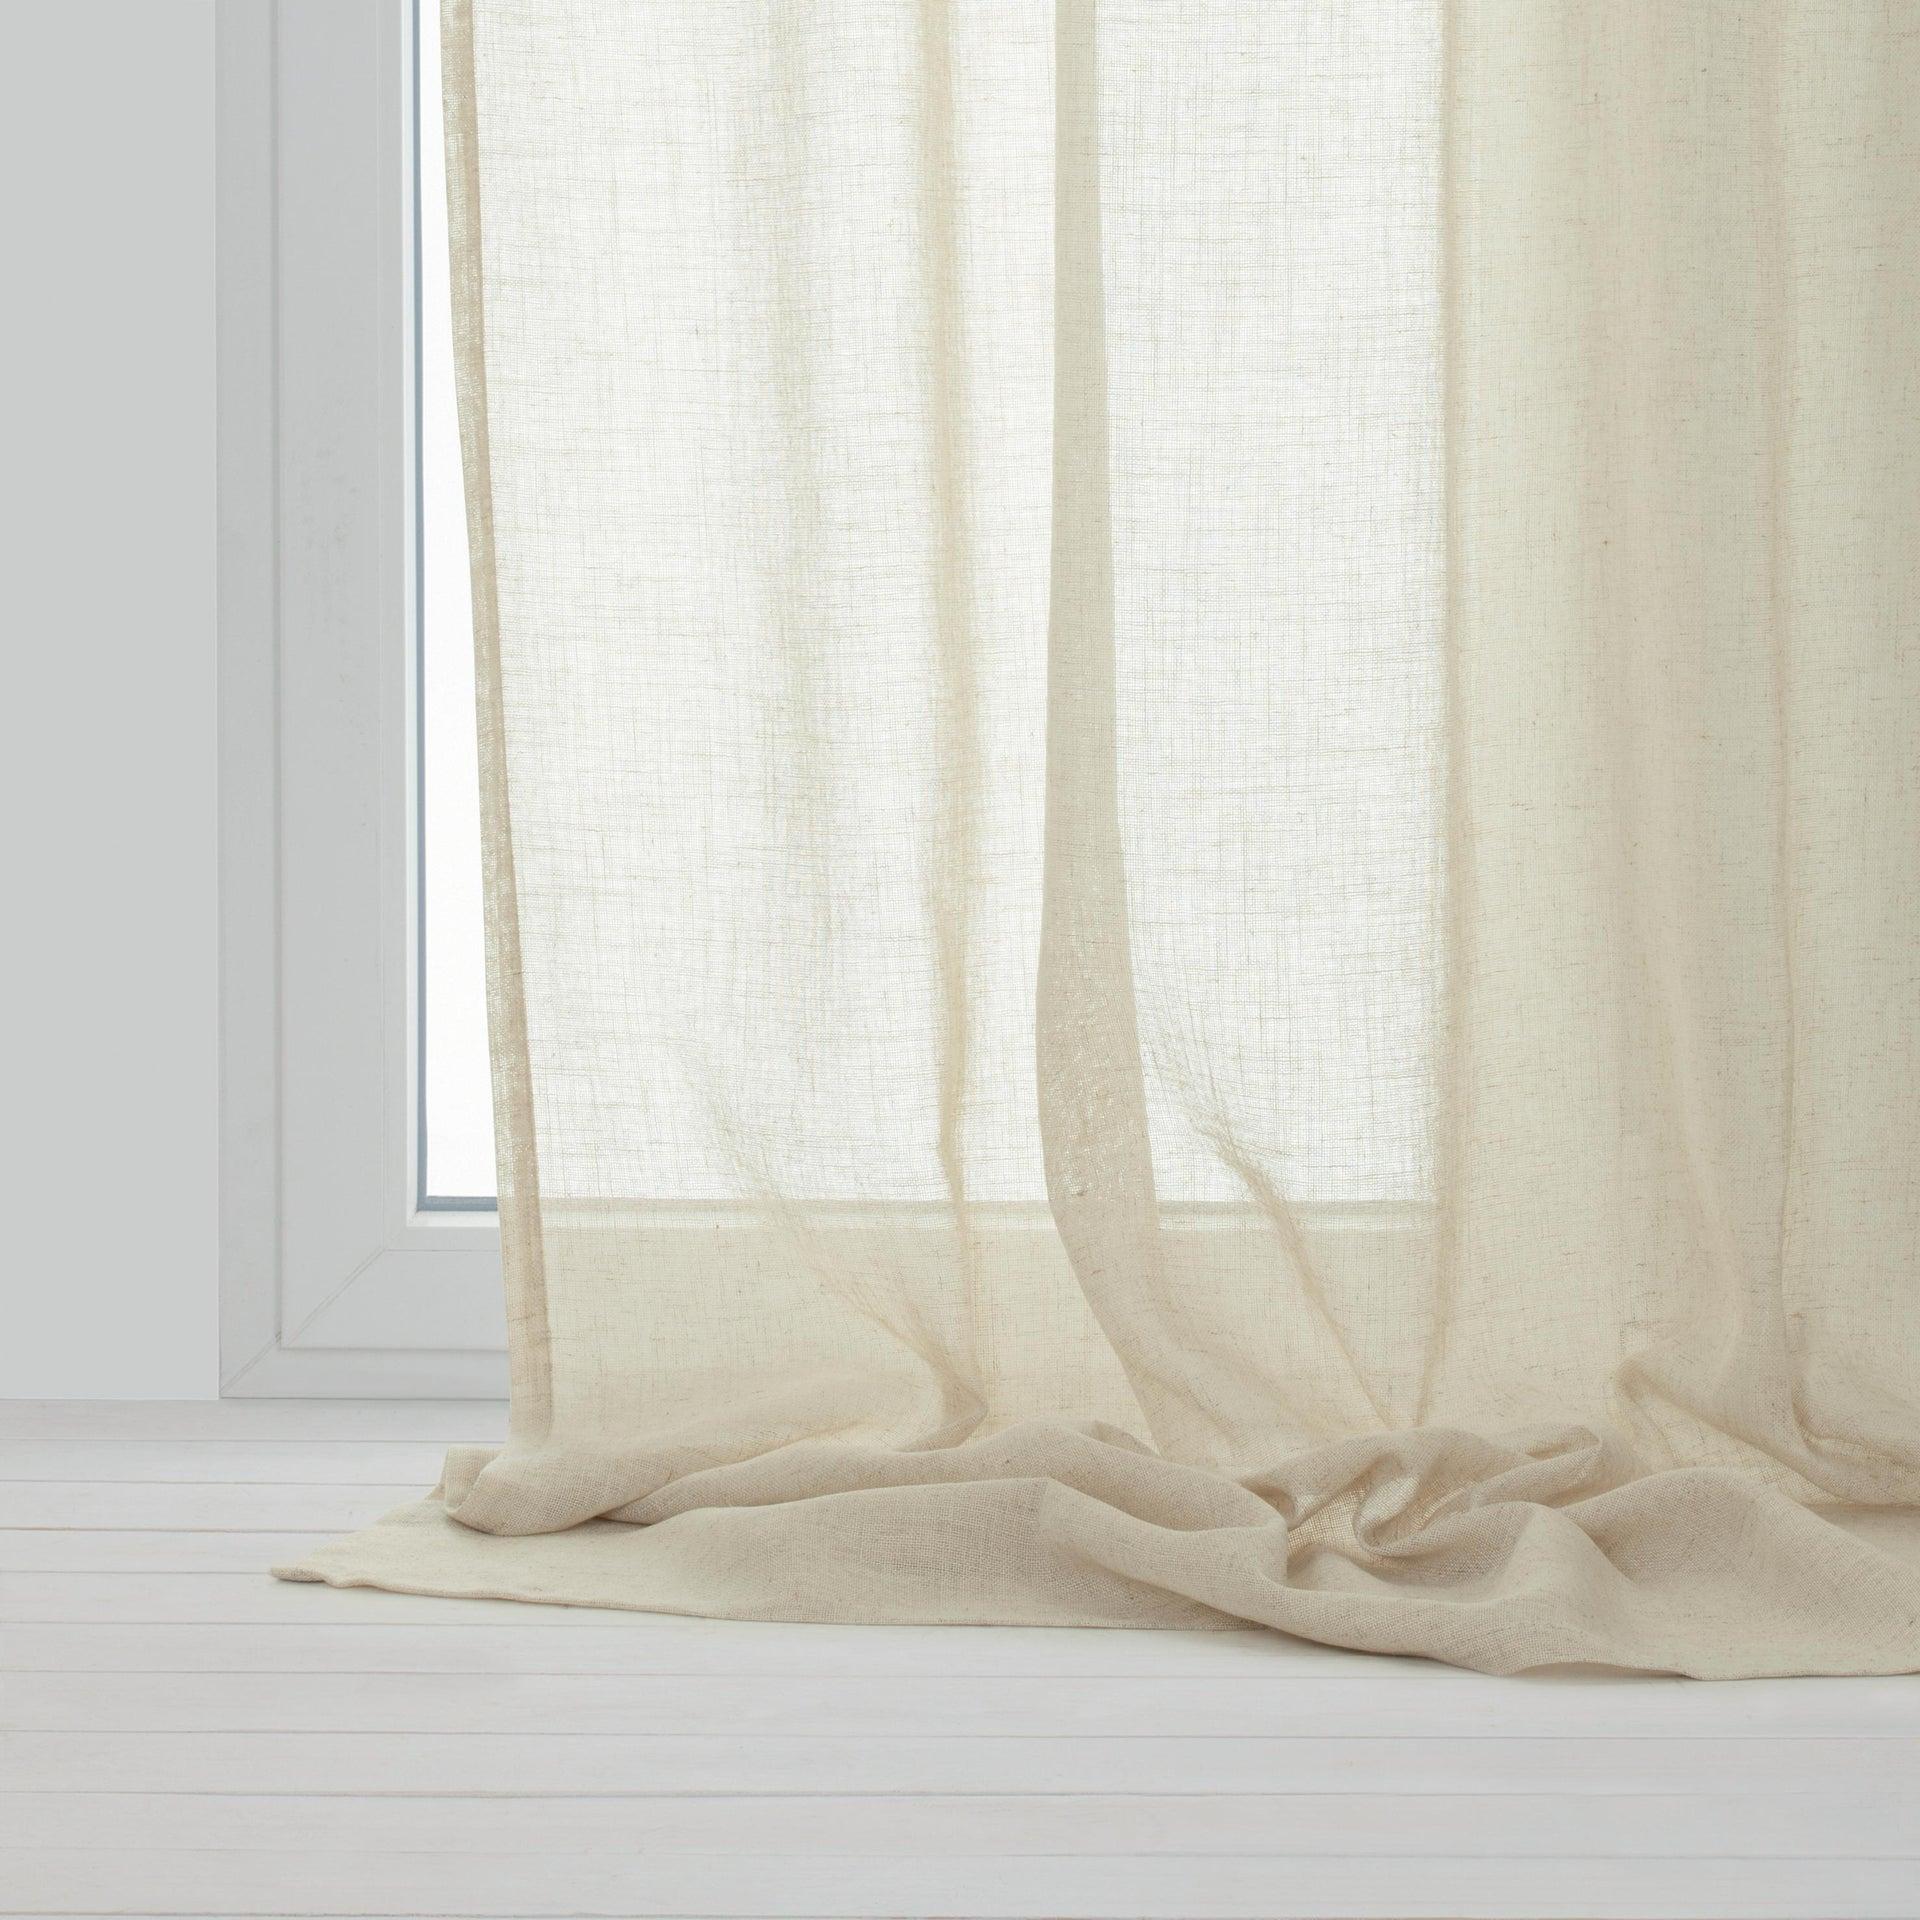 Tenda INSPIRE Charlina beige occhielli 140 x 280 cm - 3